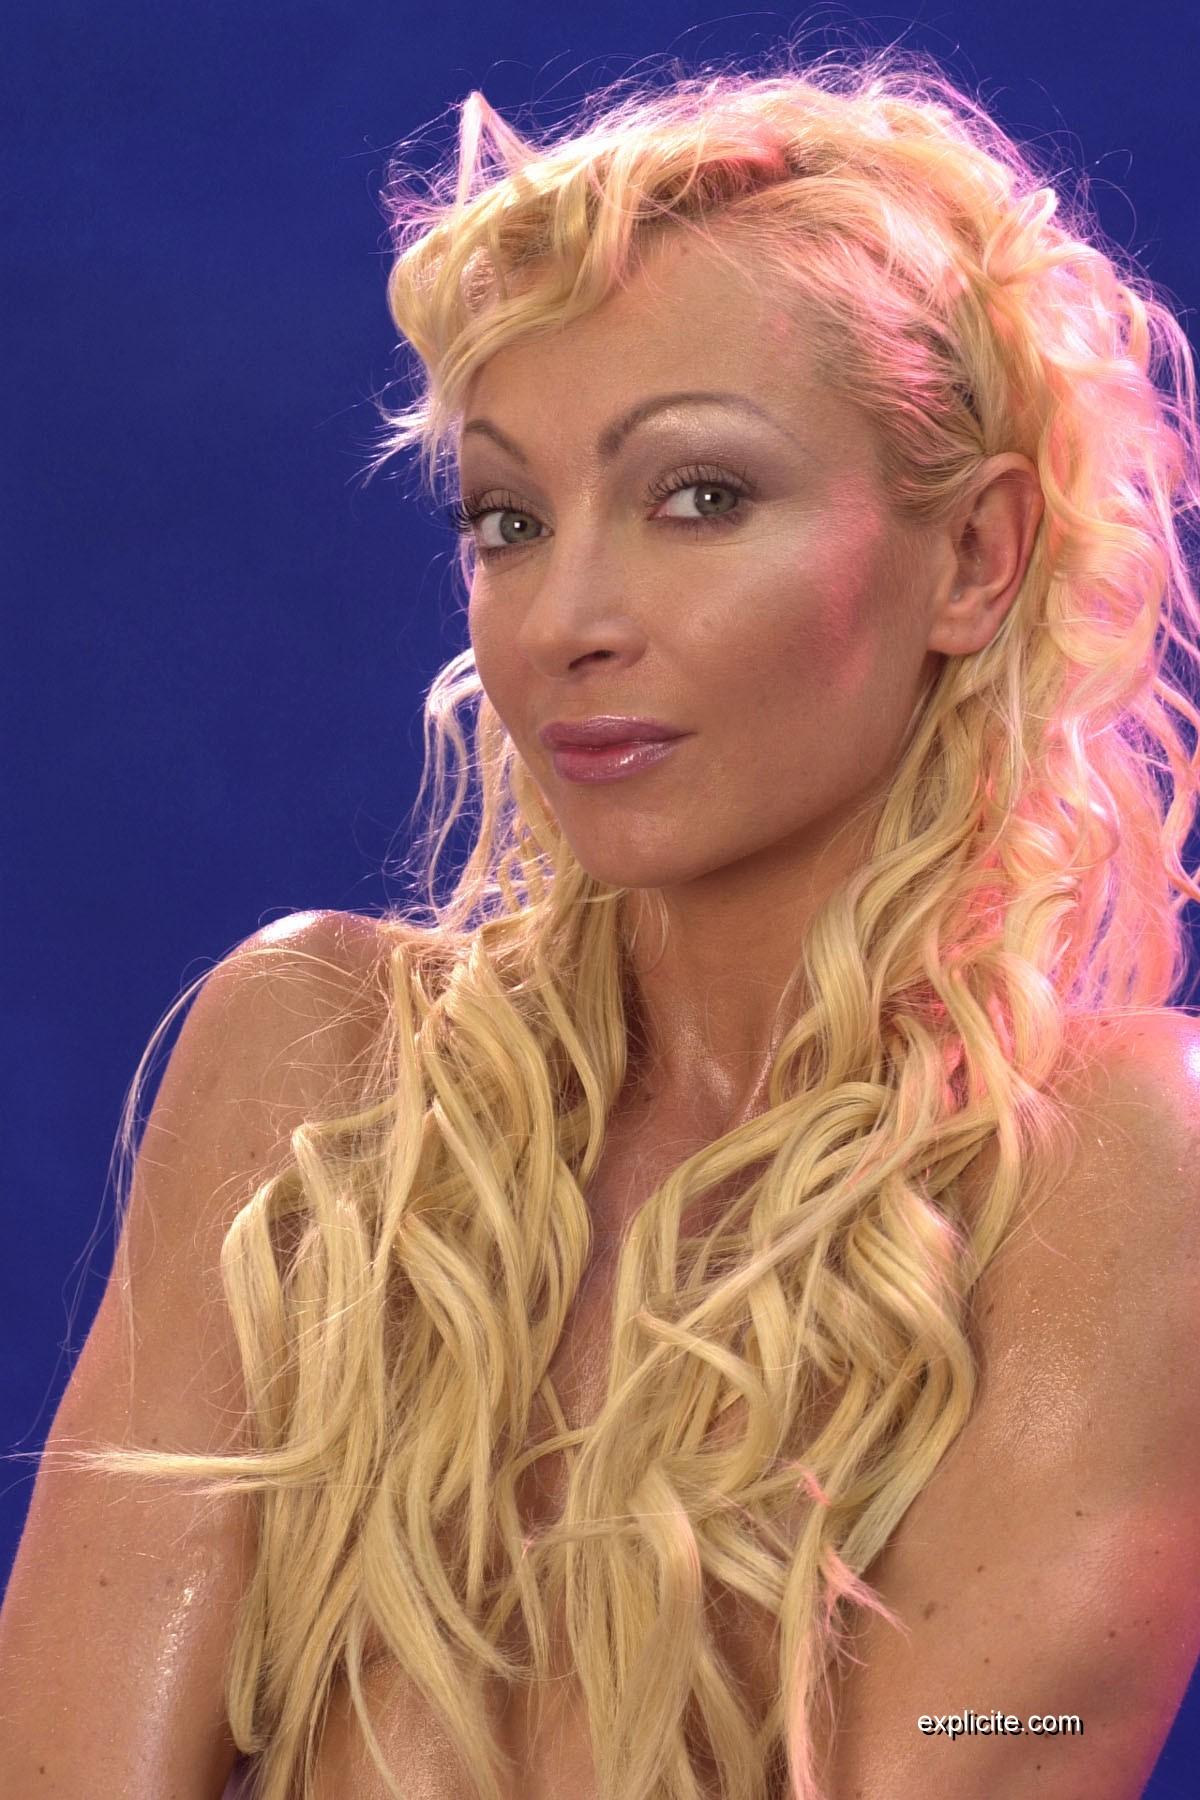 Adalina perron histoires de sexes 2009 - 1 part 2